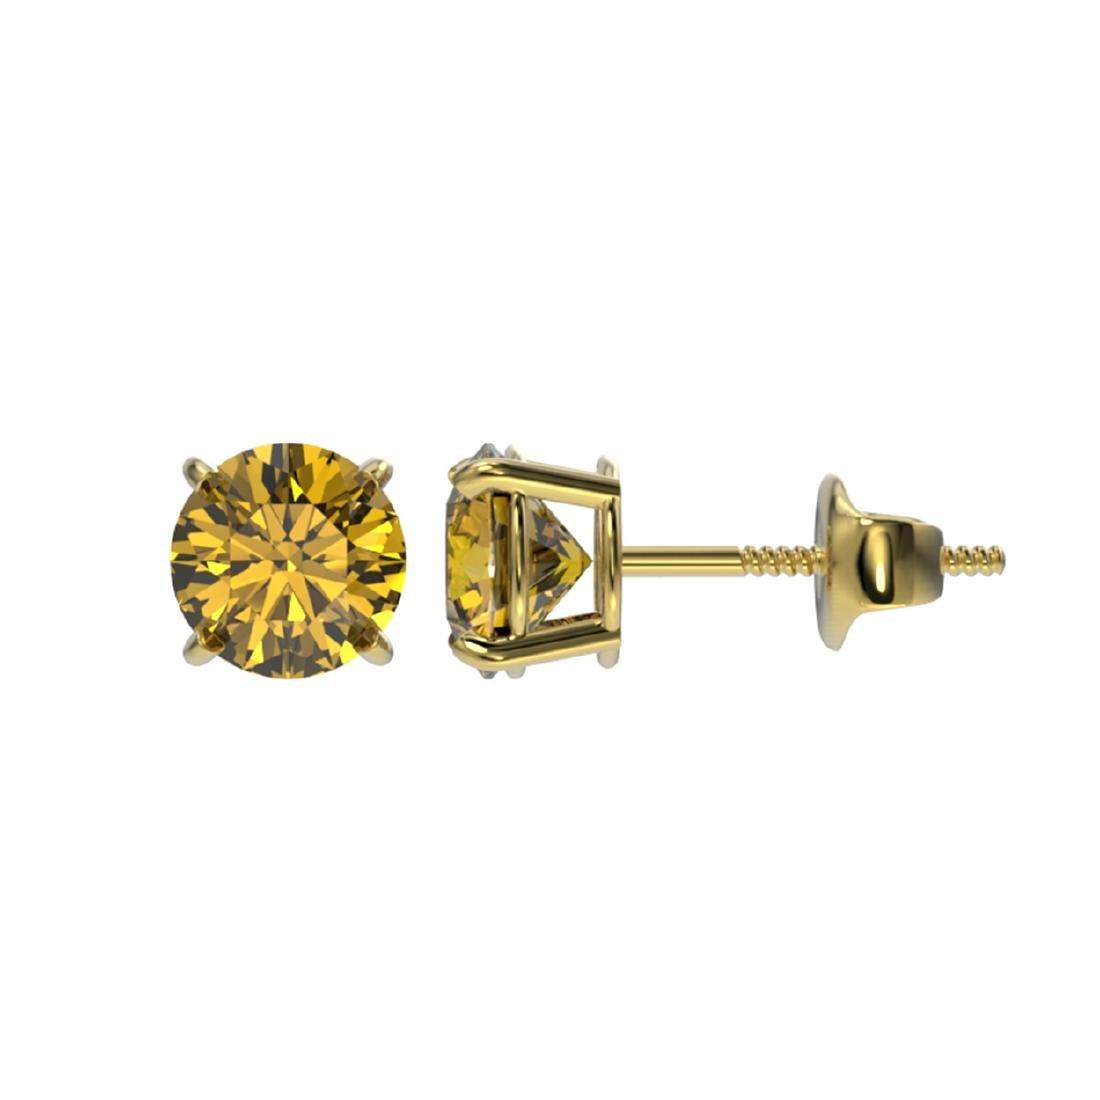 1 ctw Intense Yellow Diamond Stud Earrings 10K Yellow - 2